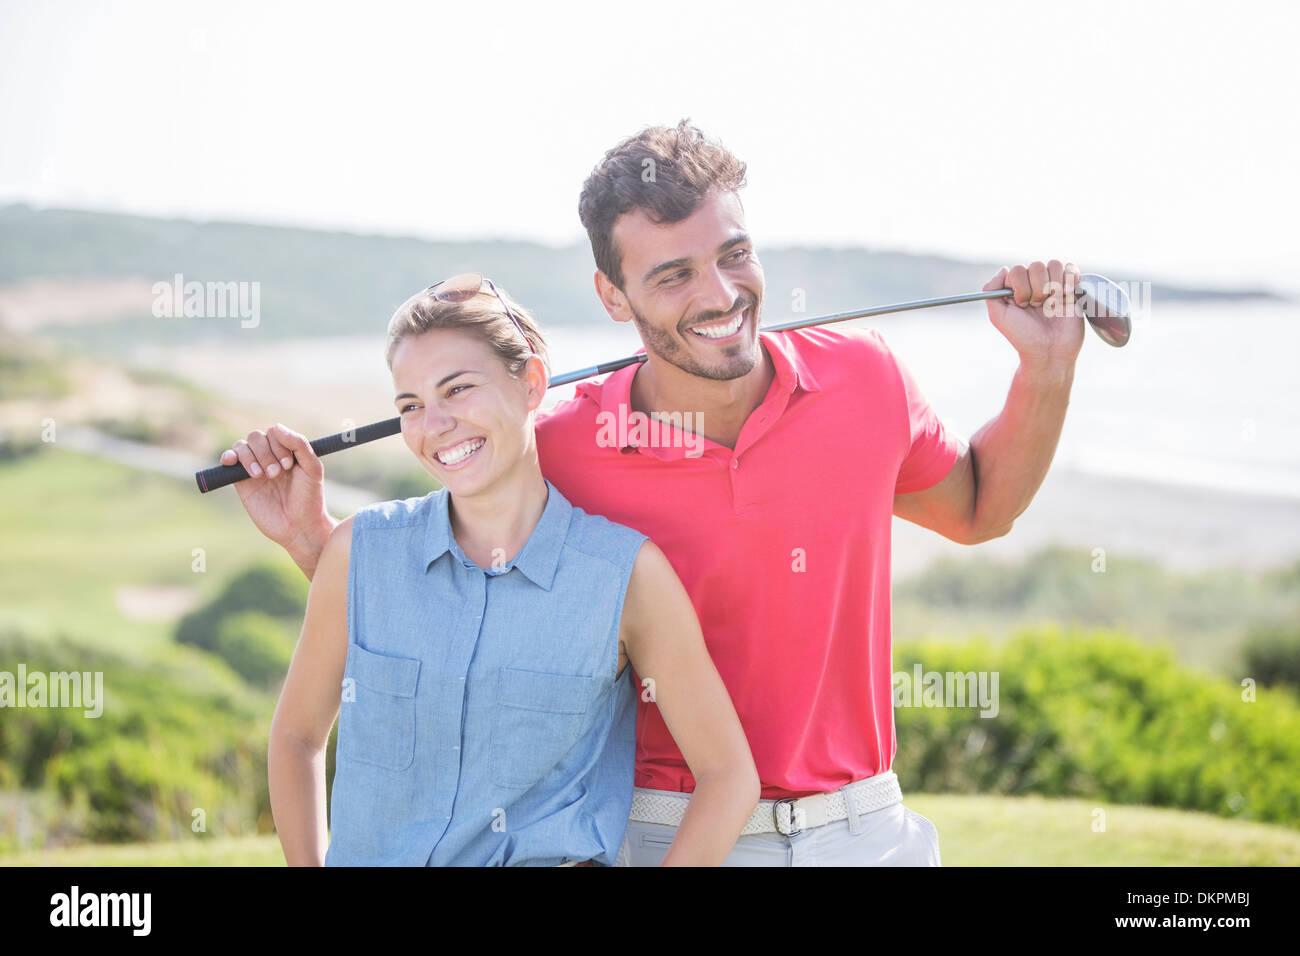 Brautpaar auf Golfplatz Stockbild